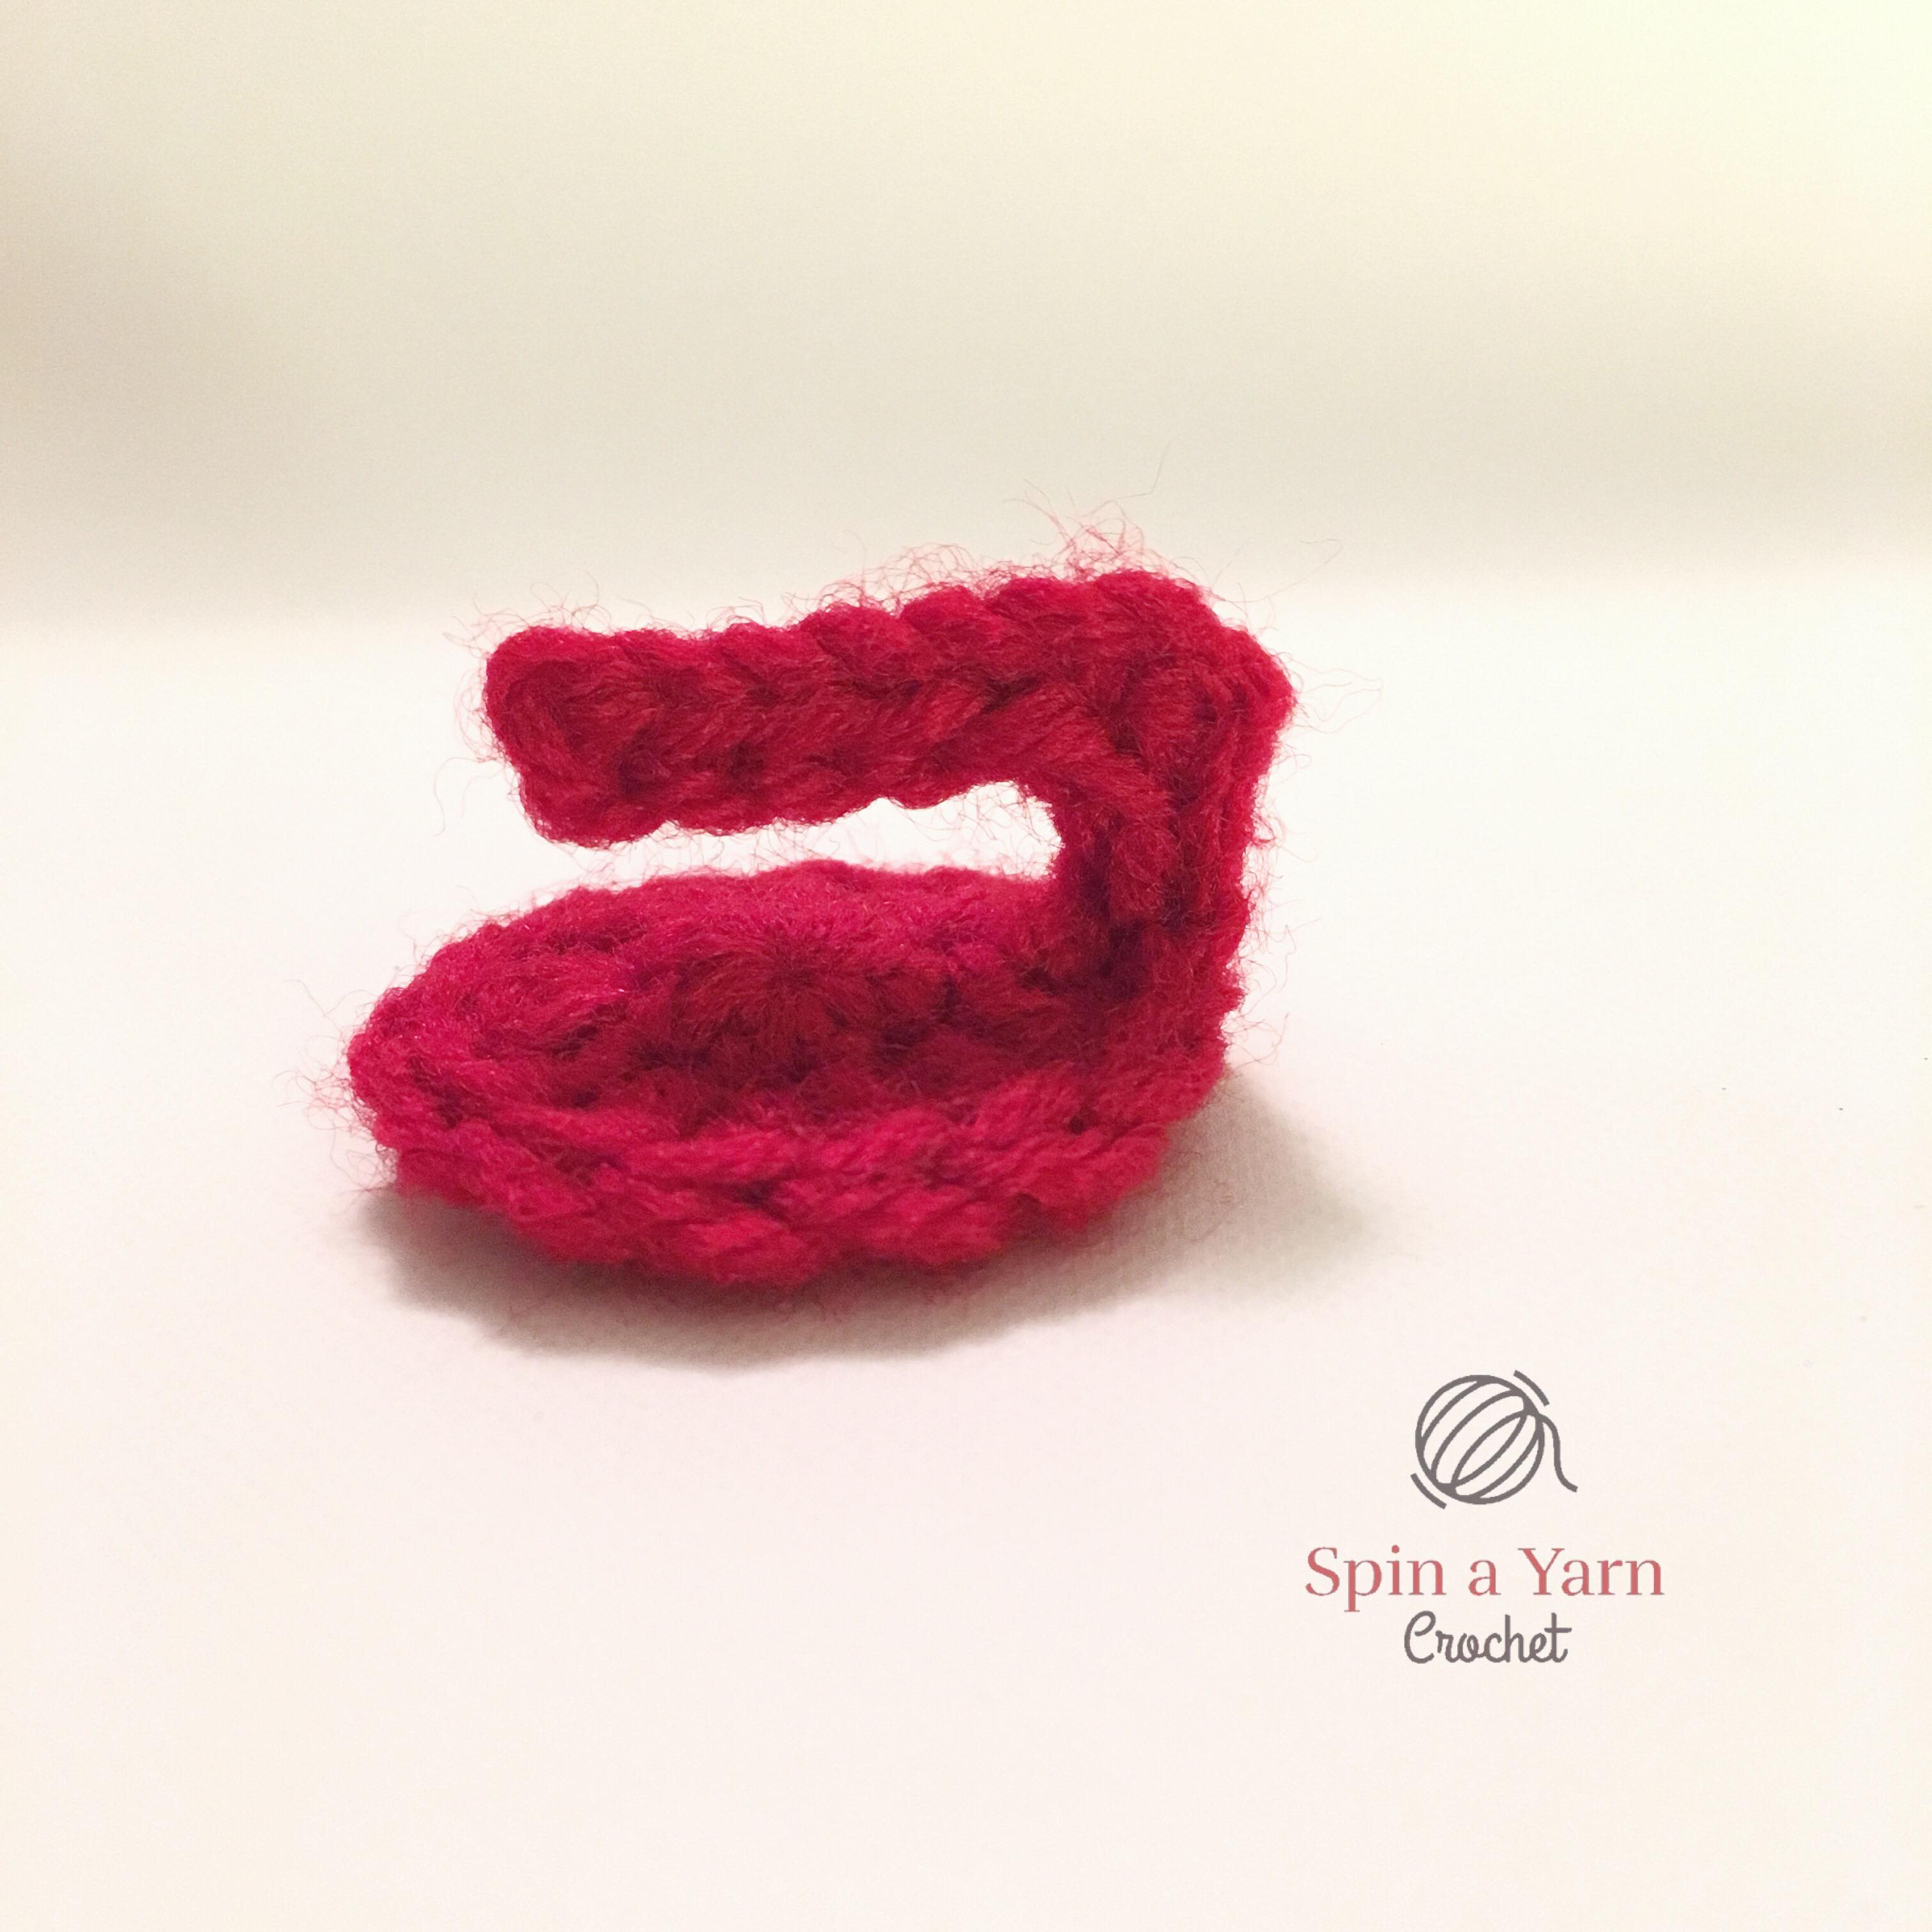 Crochet curling stone handle